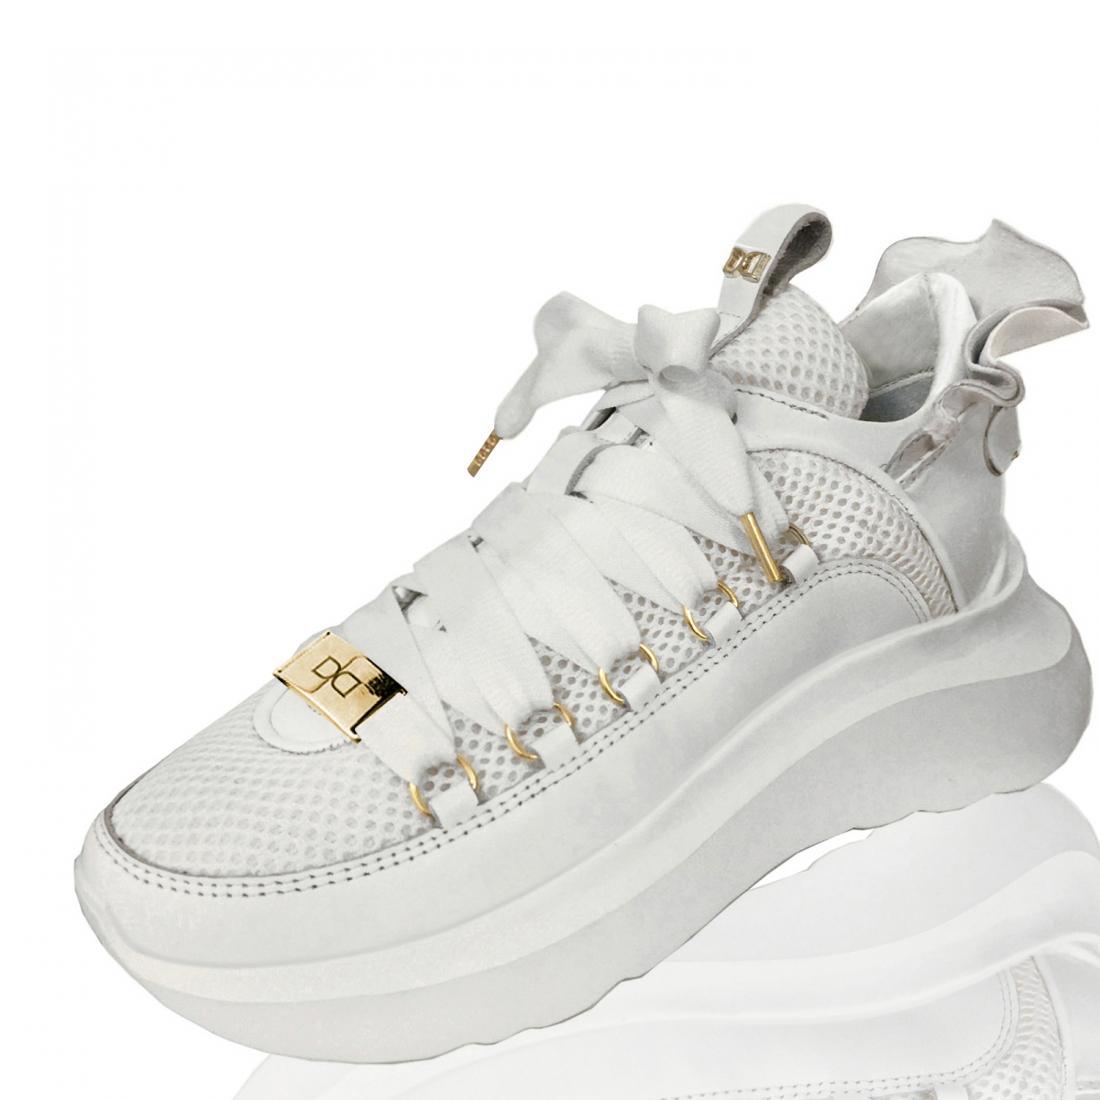 sneakers-2-white-2